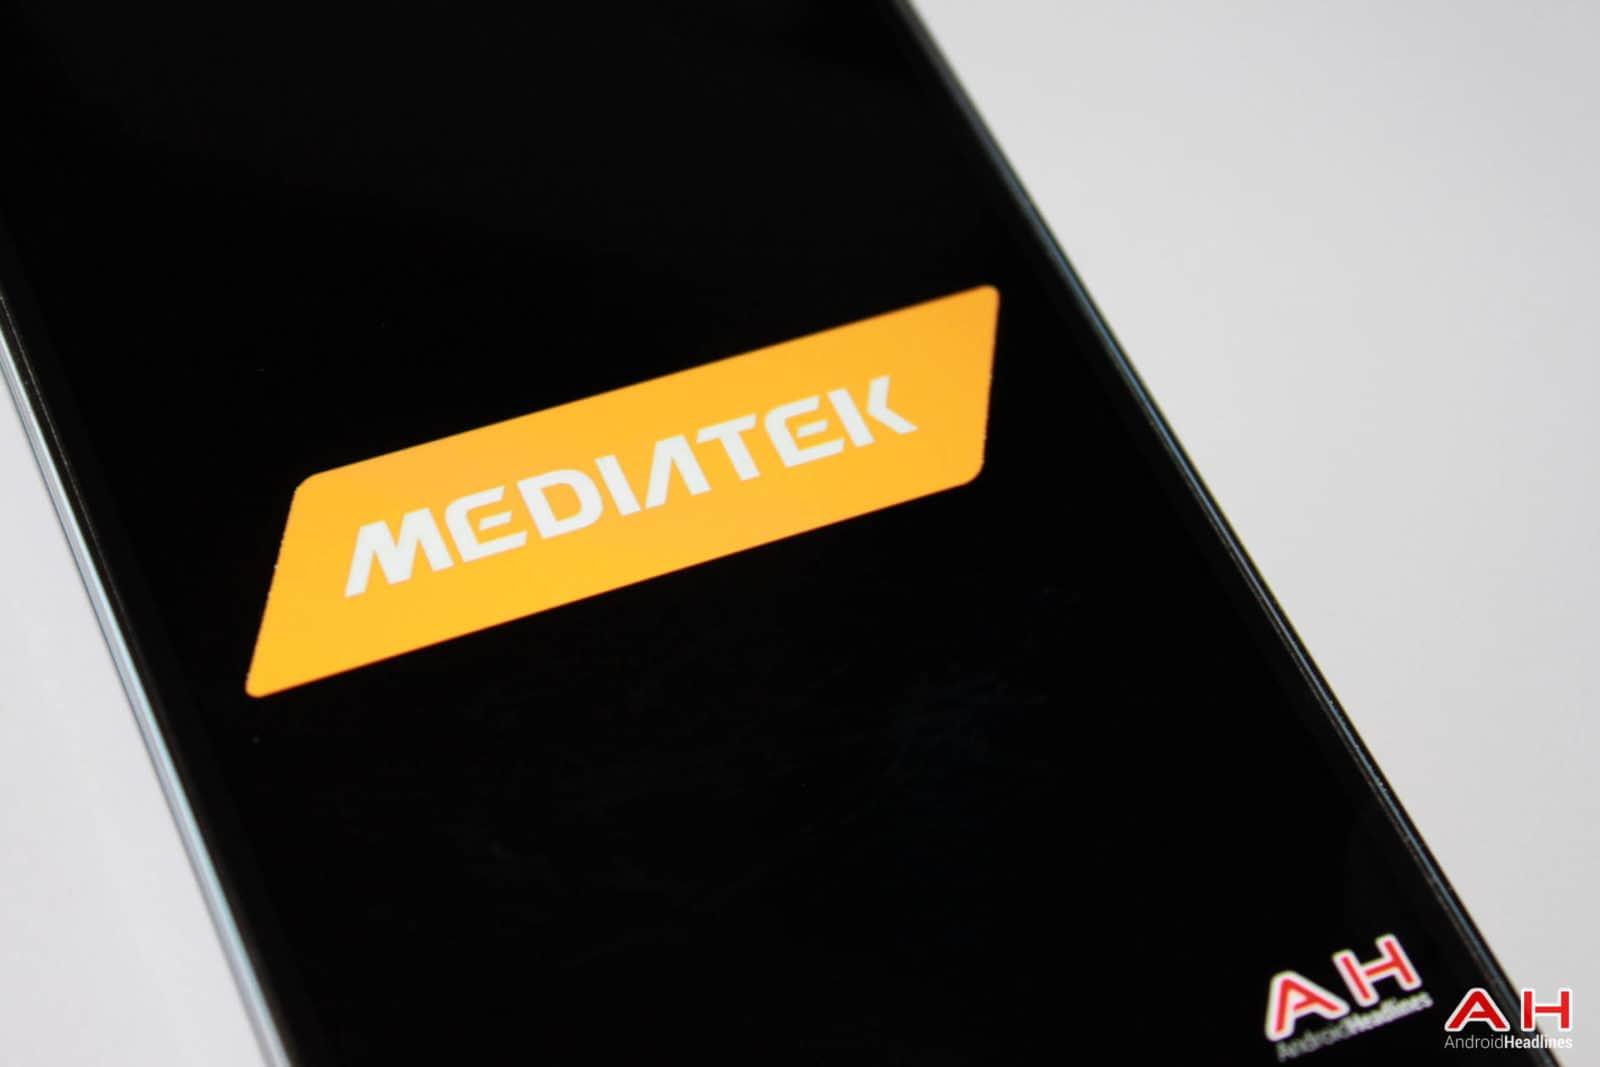 AH Mediatek Logo 1.1